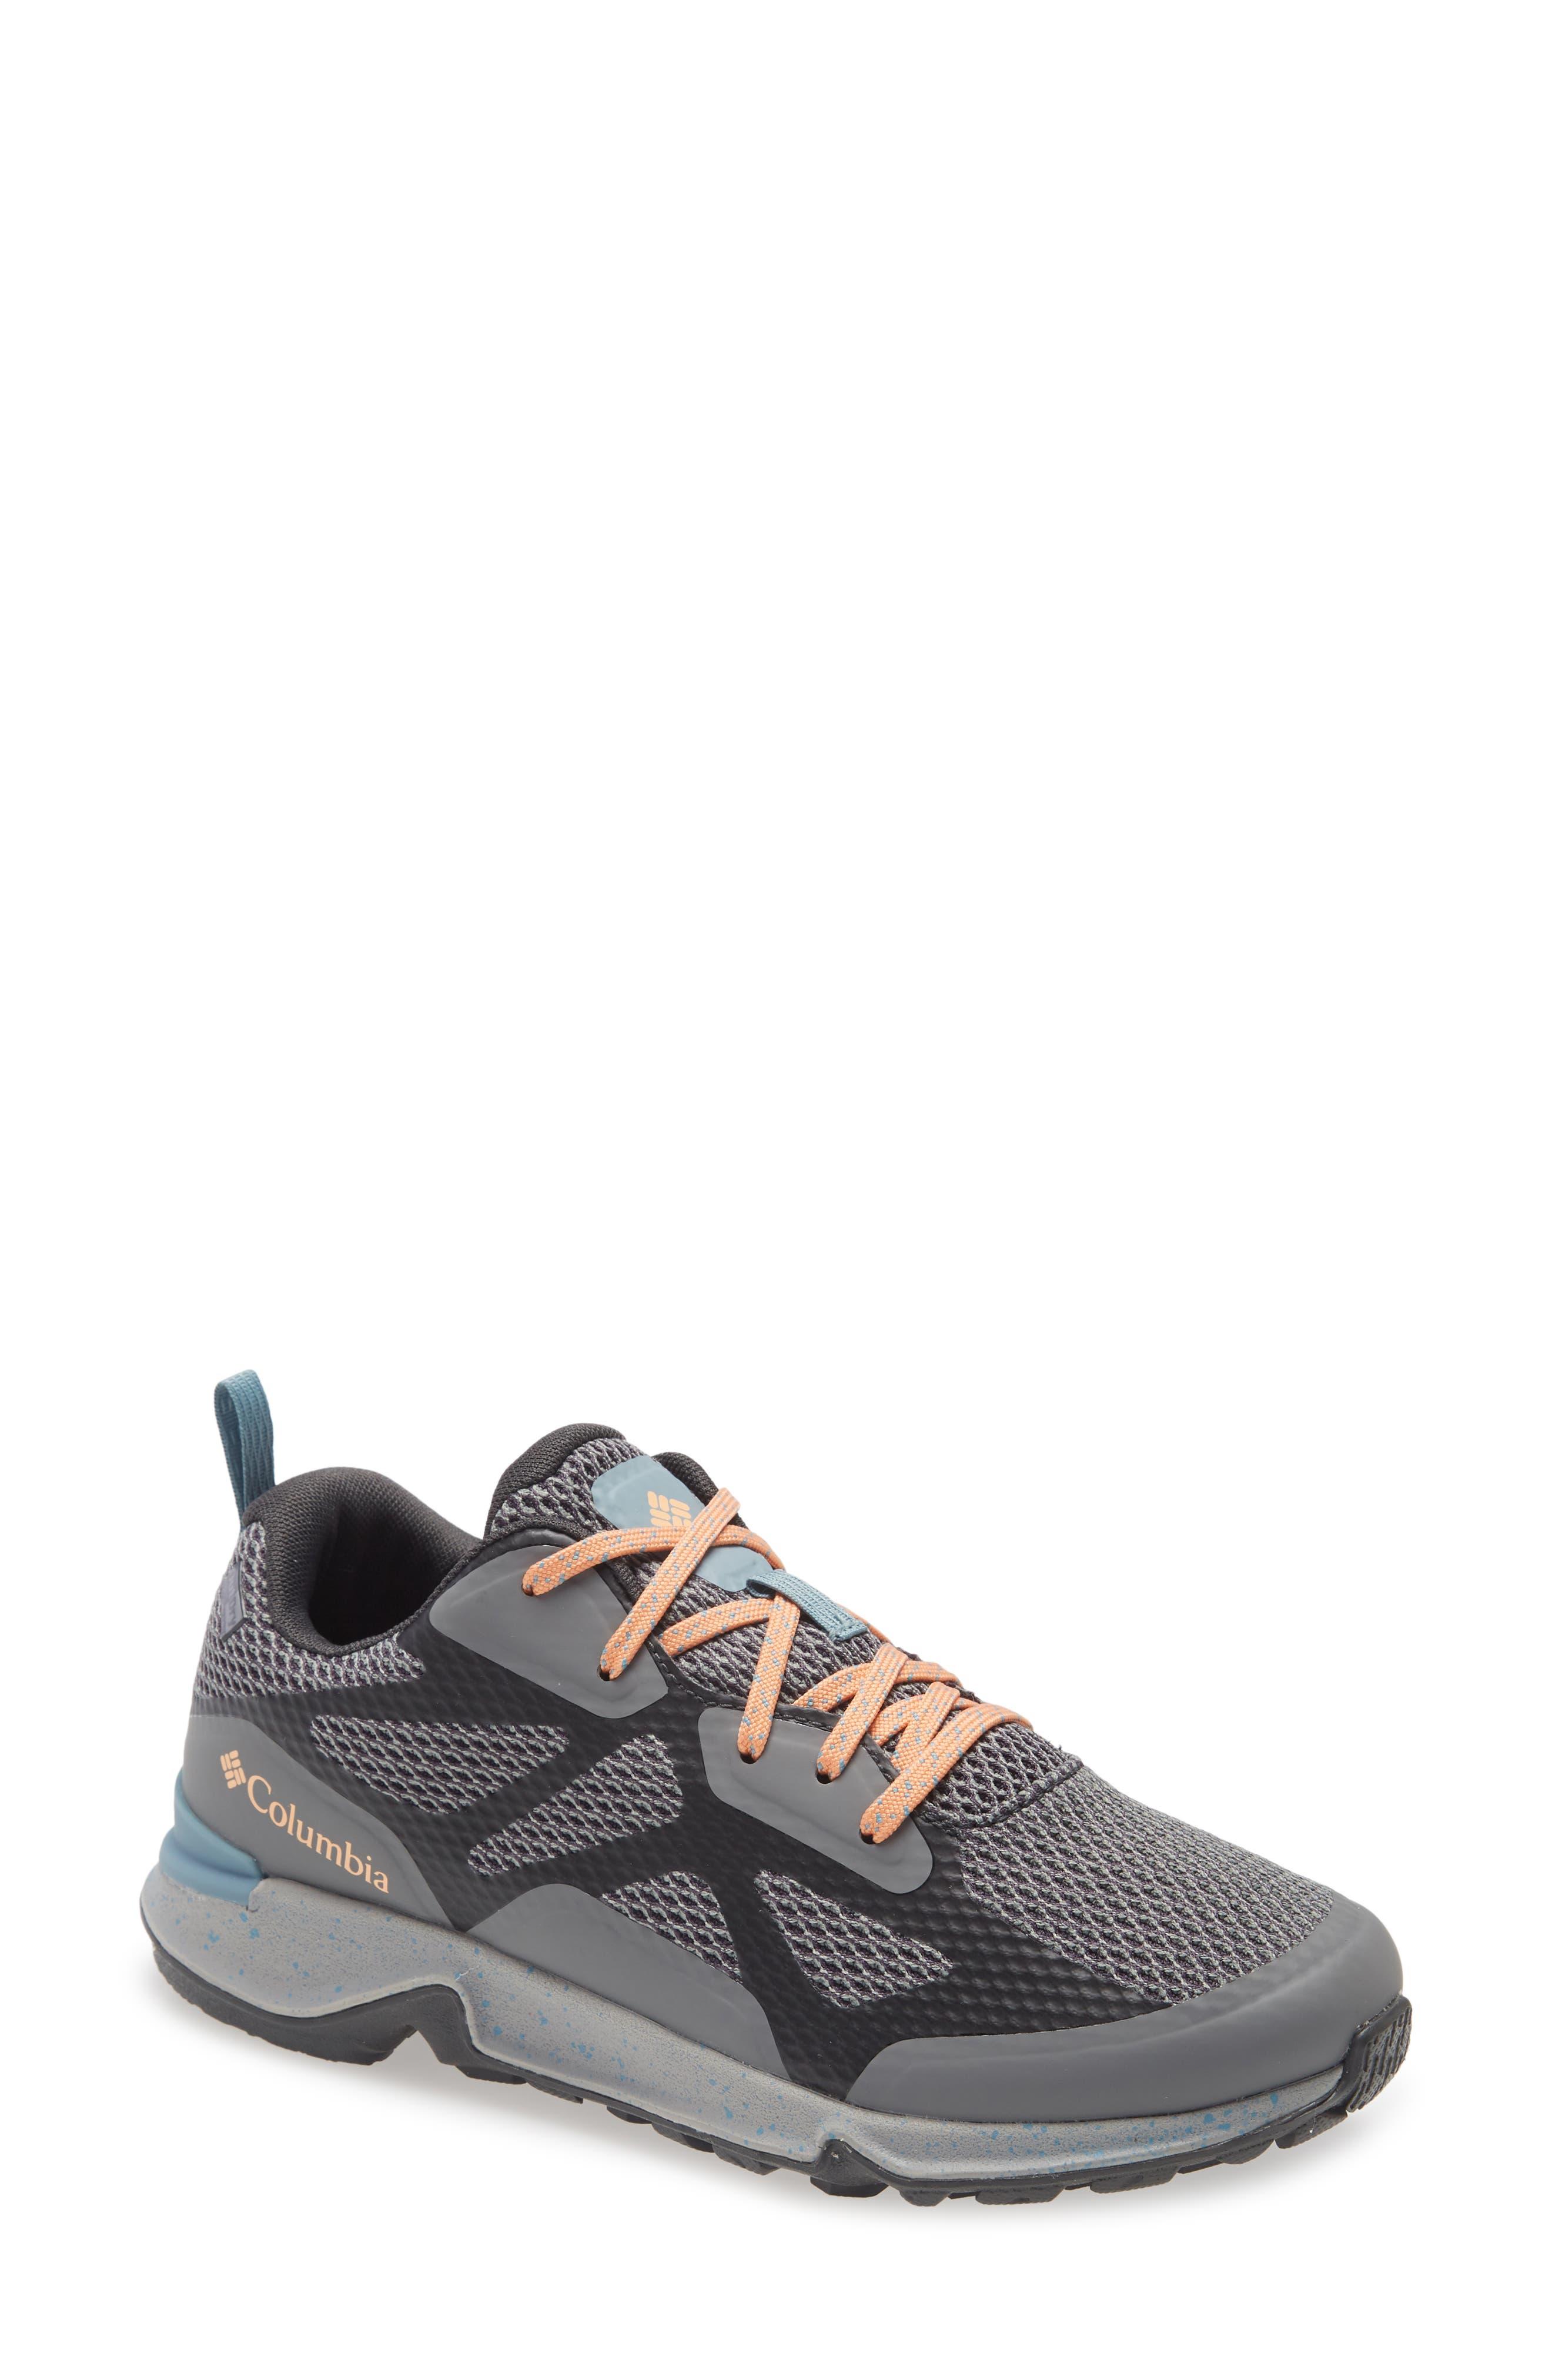 Vitesse(TM) Outdry(TM) Waterproof Hiking Shoe